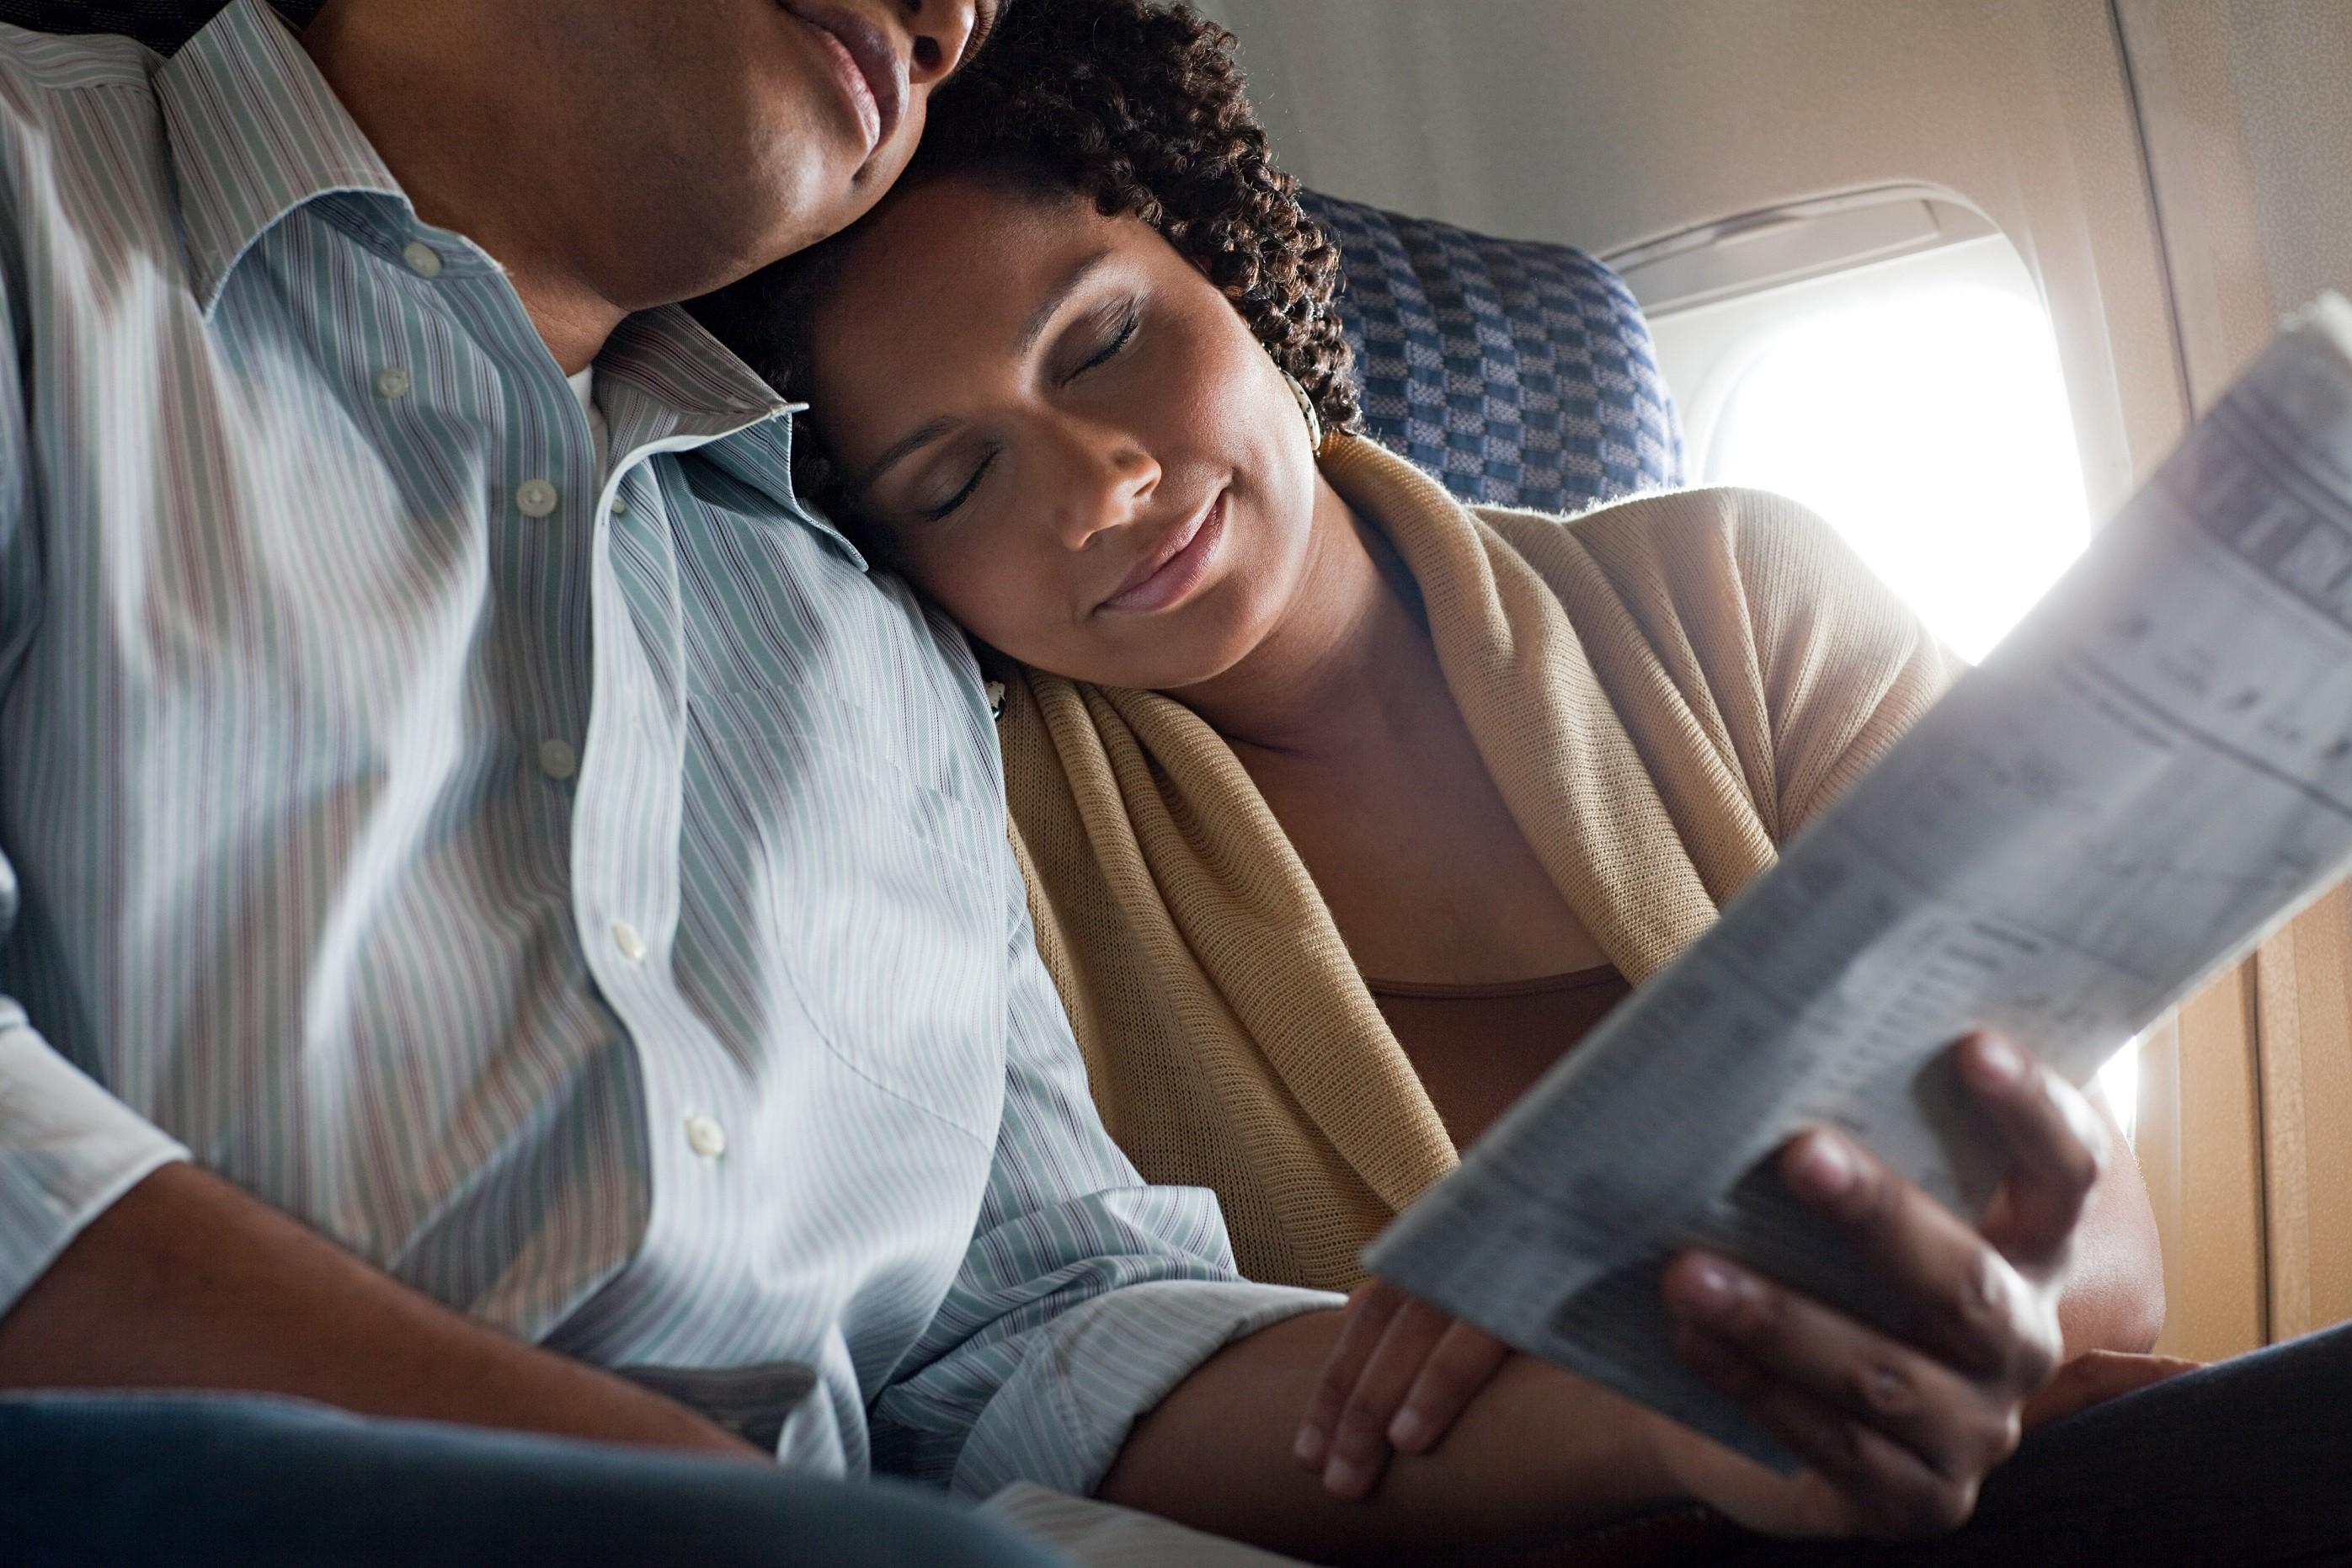 Couple asleep on a plane